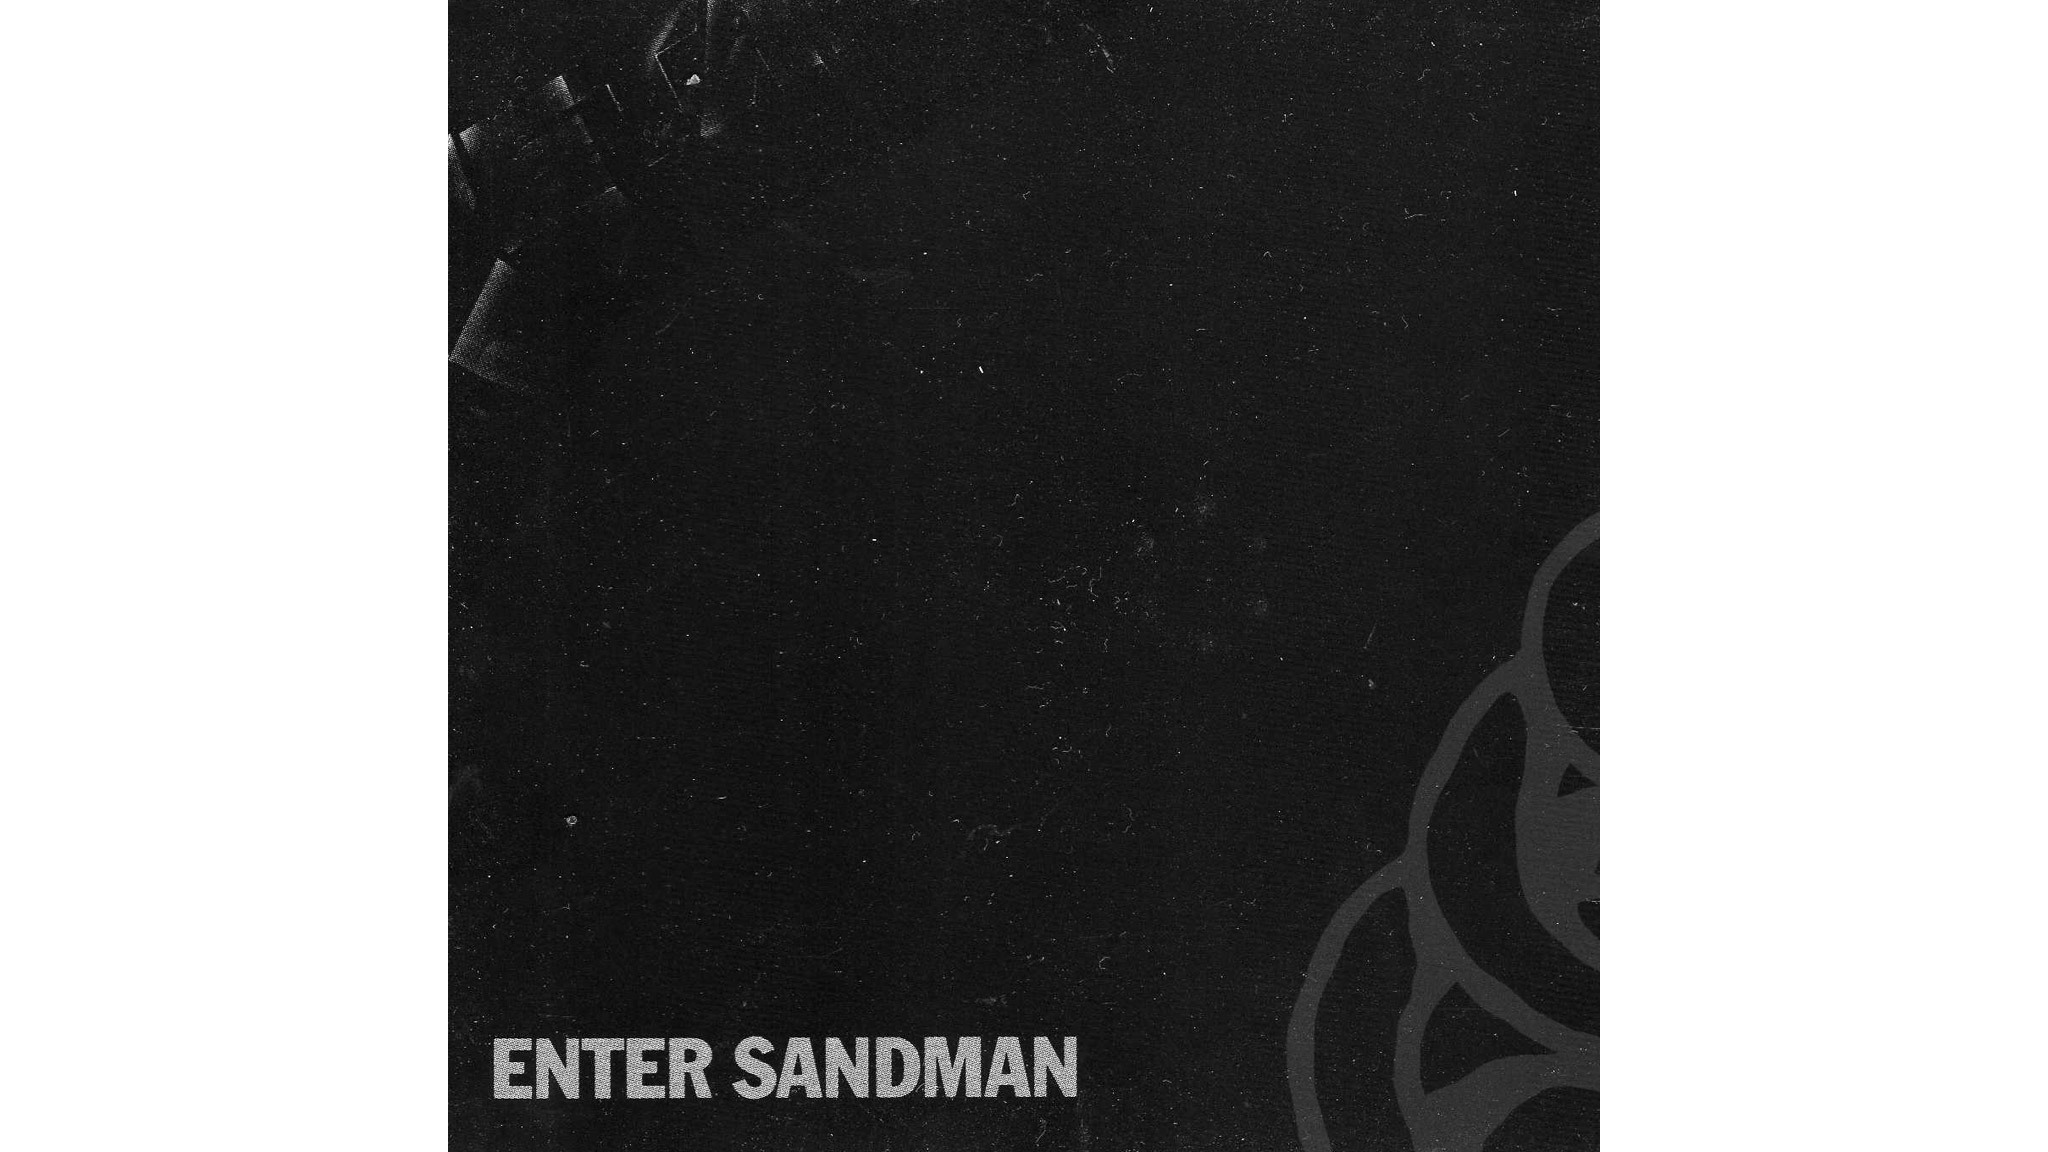 metallica, enter sandman